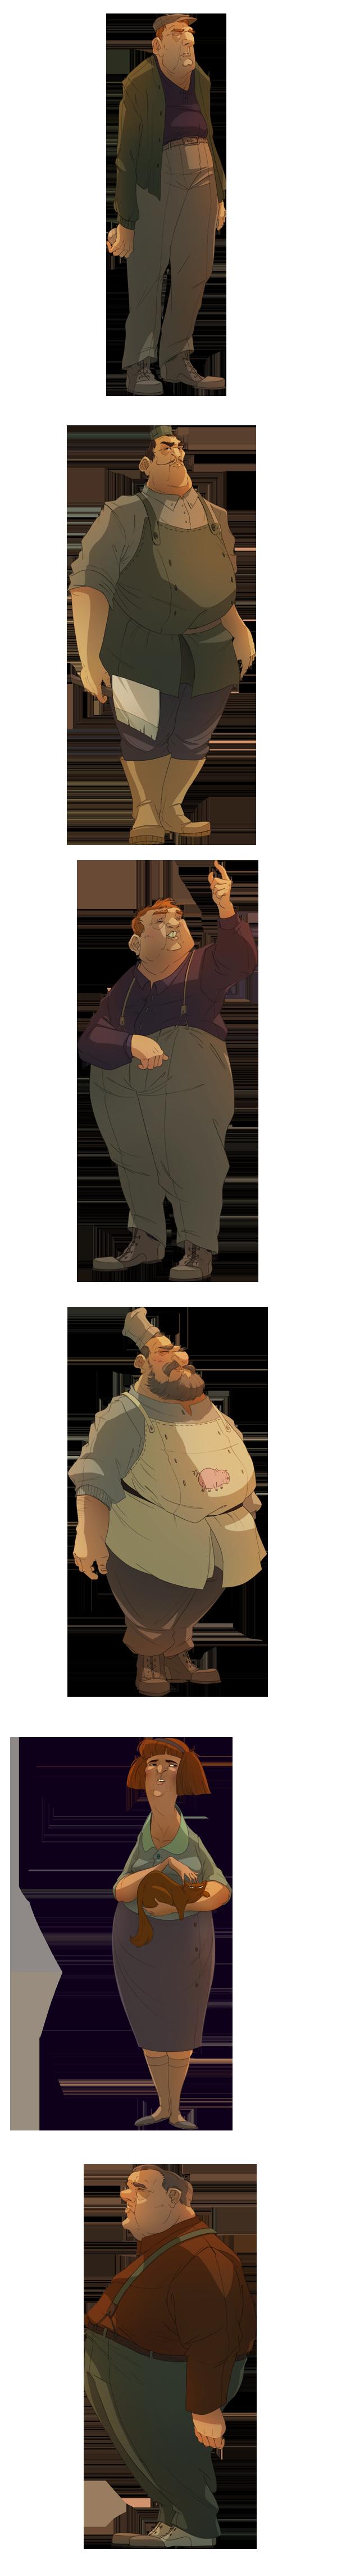 Beautiful Character Design by Vivien Bertin